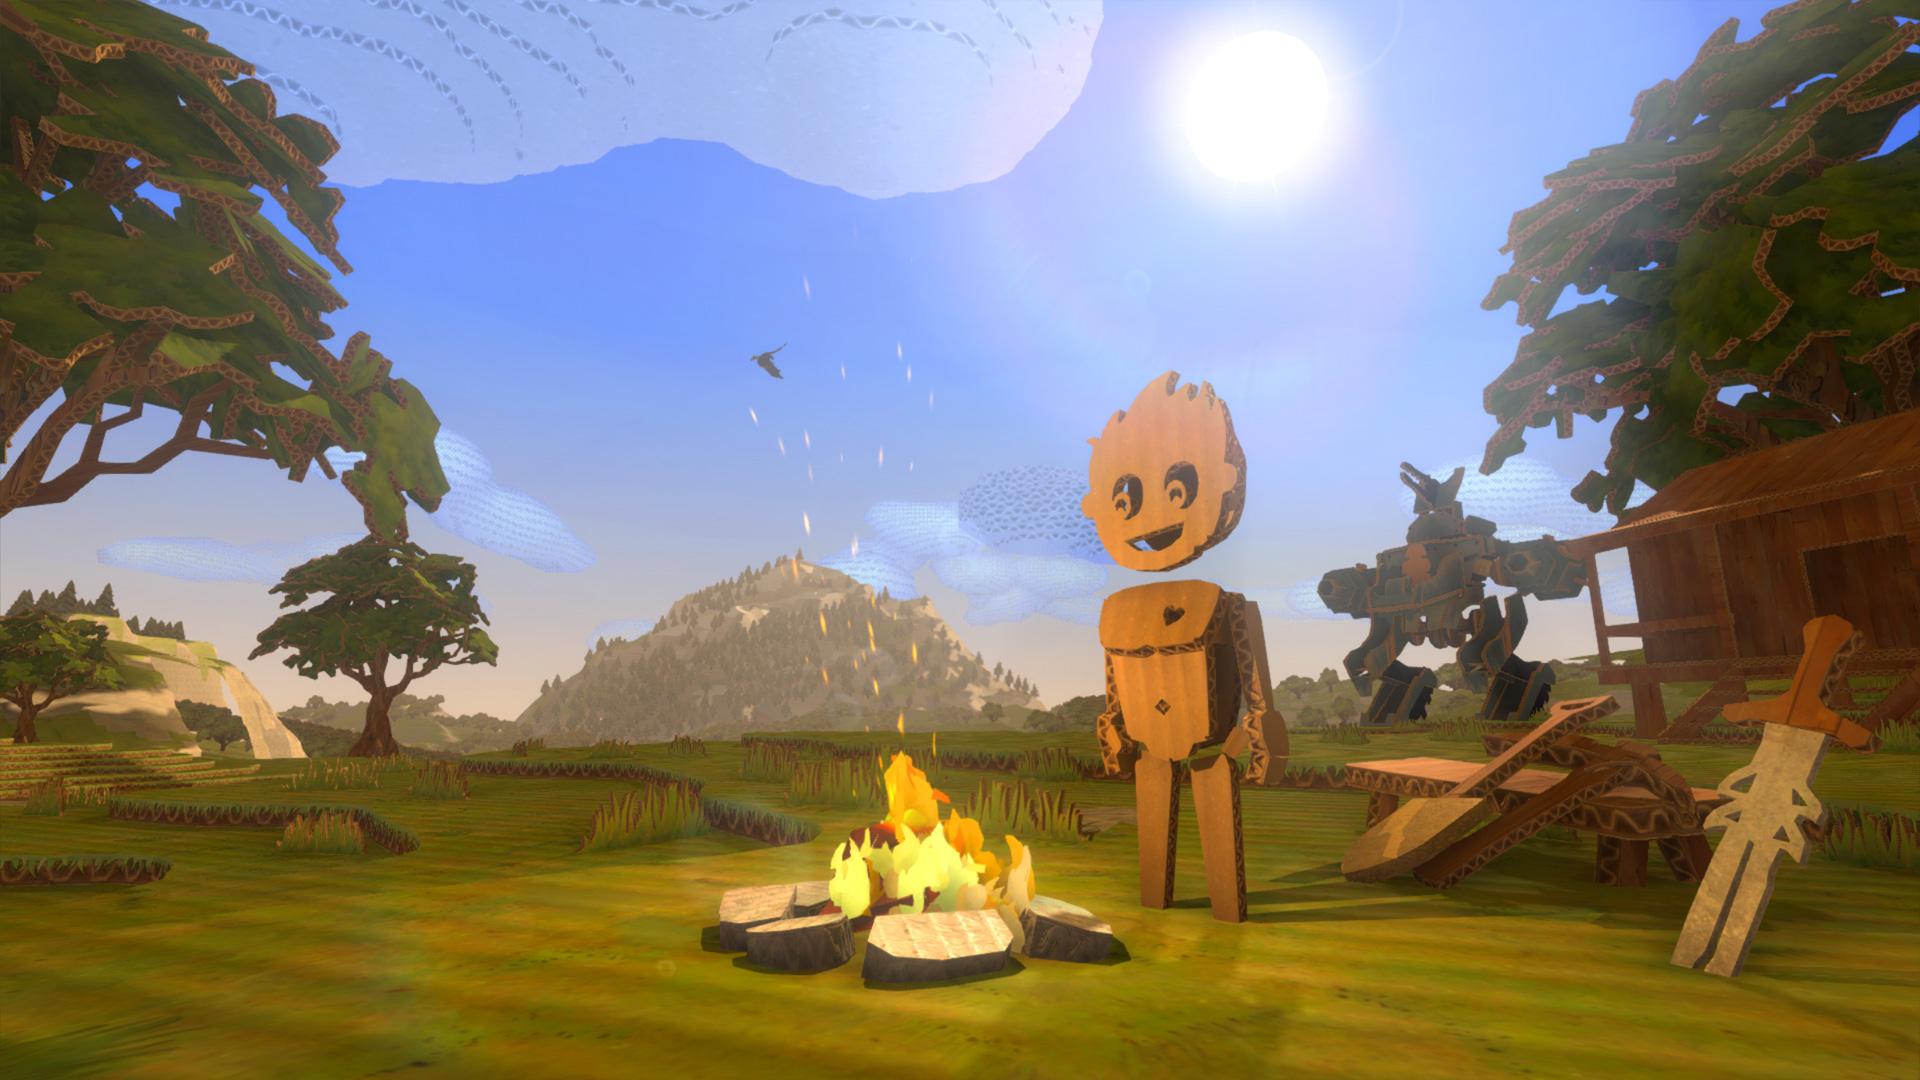 Cardlife is a cute-lookin' Minecraftbut with cardboard ...